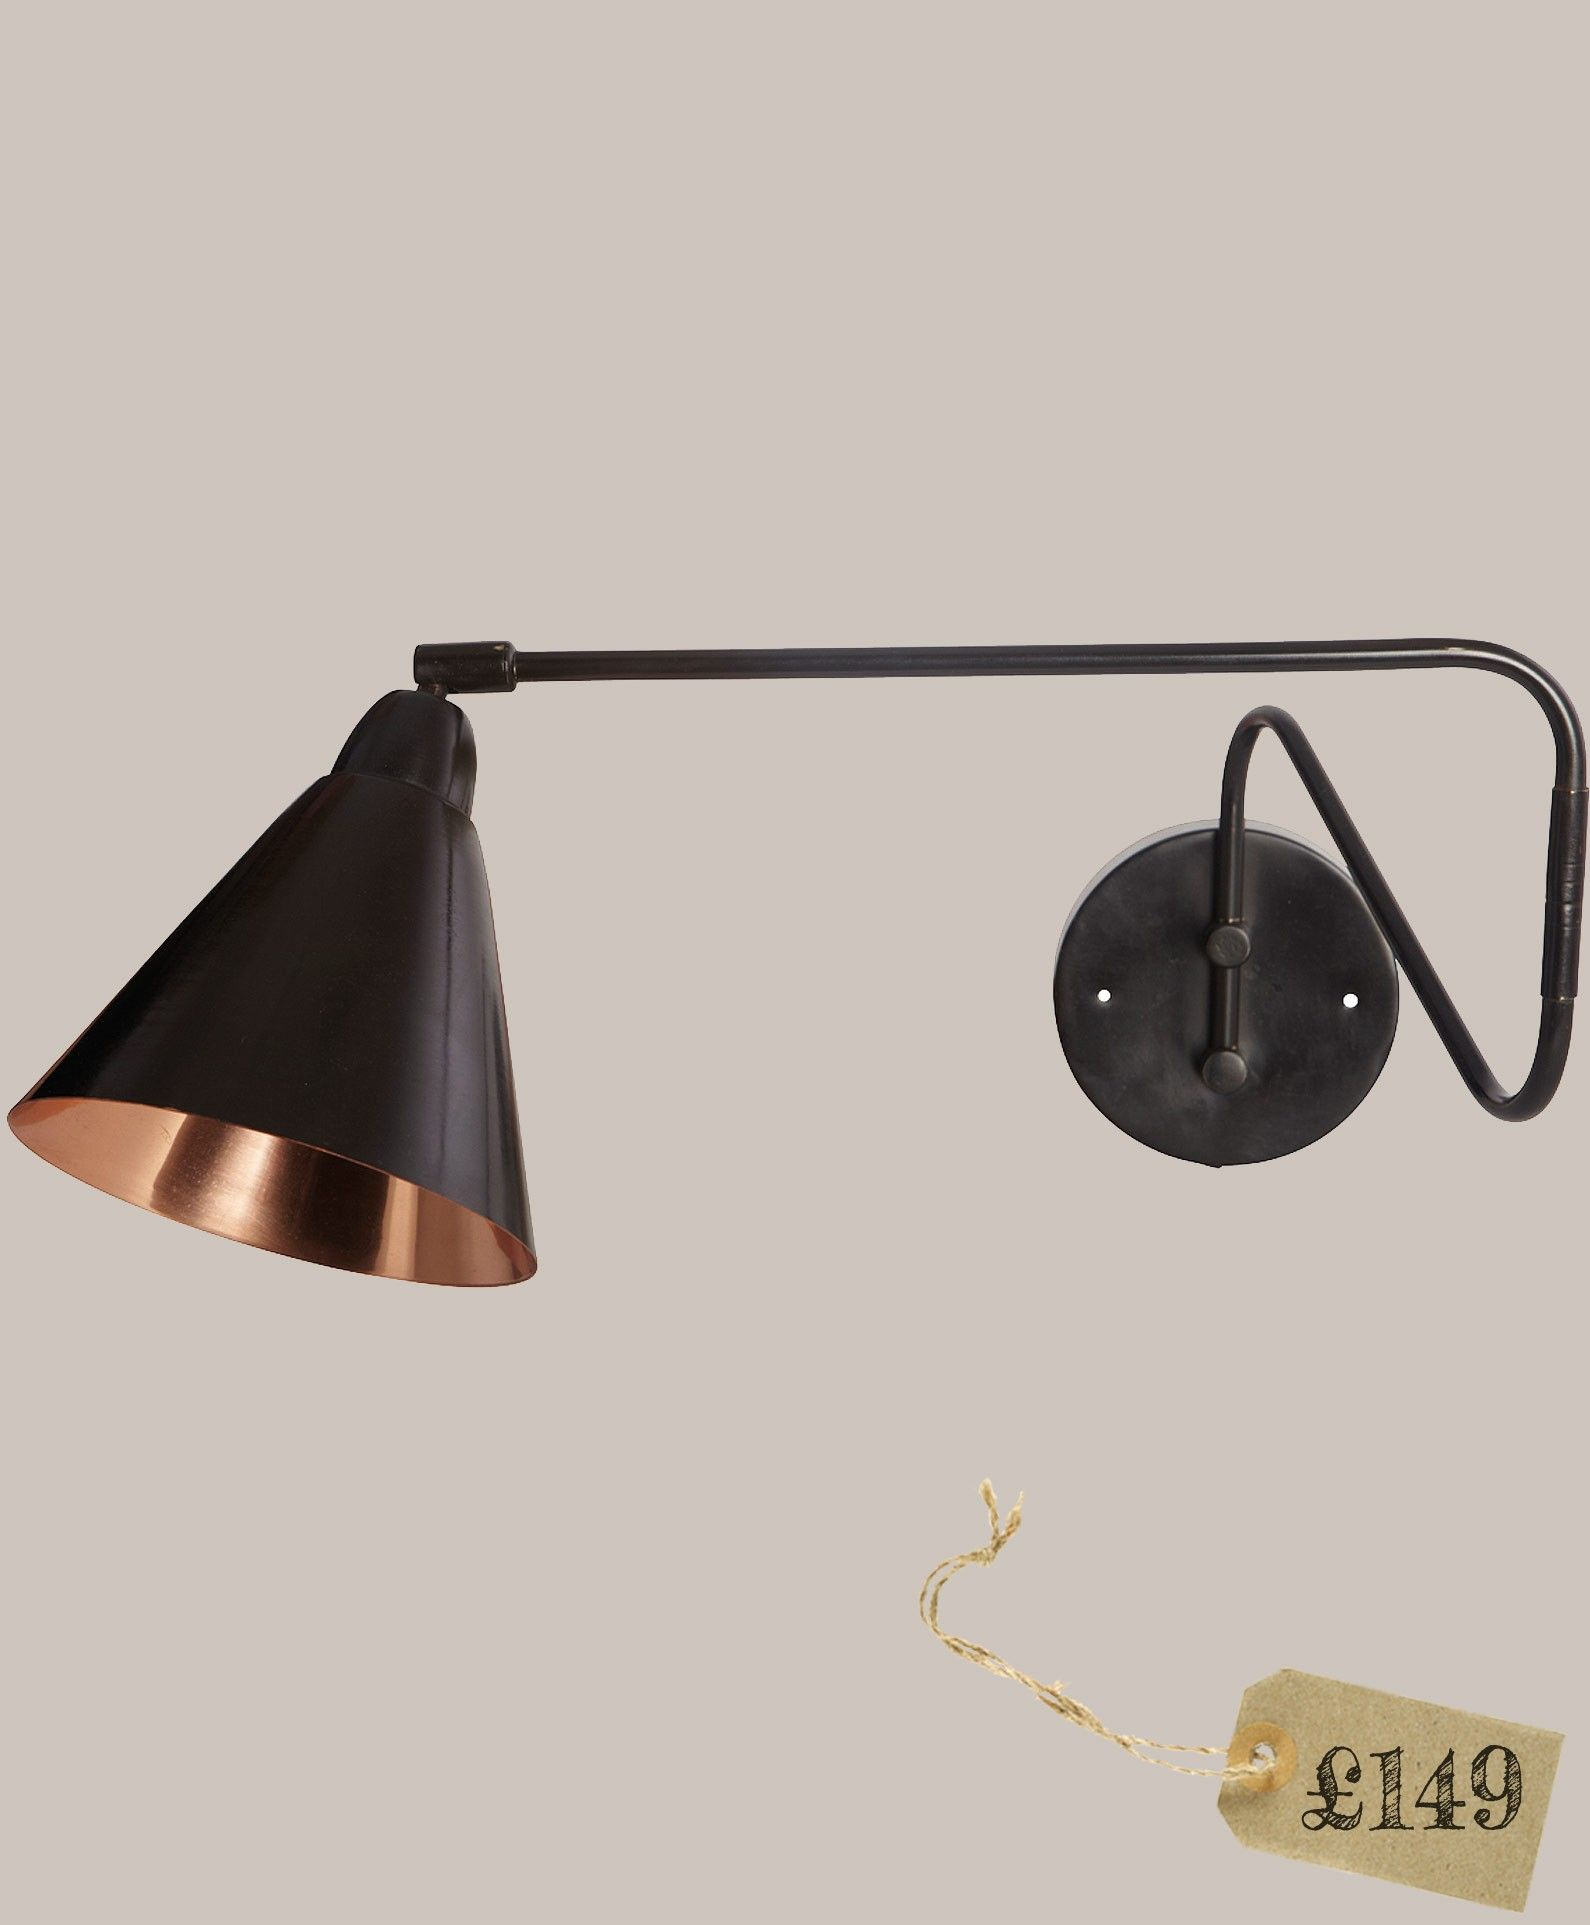 Felix Swing Arm Light From Olive Tree Copper Wall Light Wall Lights Industrial Style Wall Lights